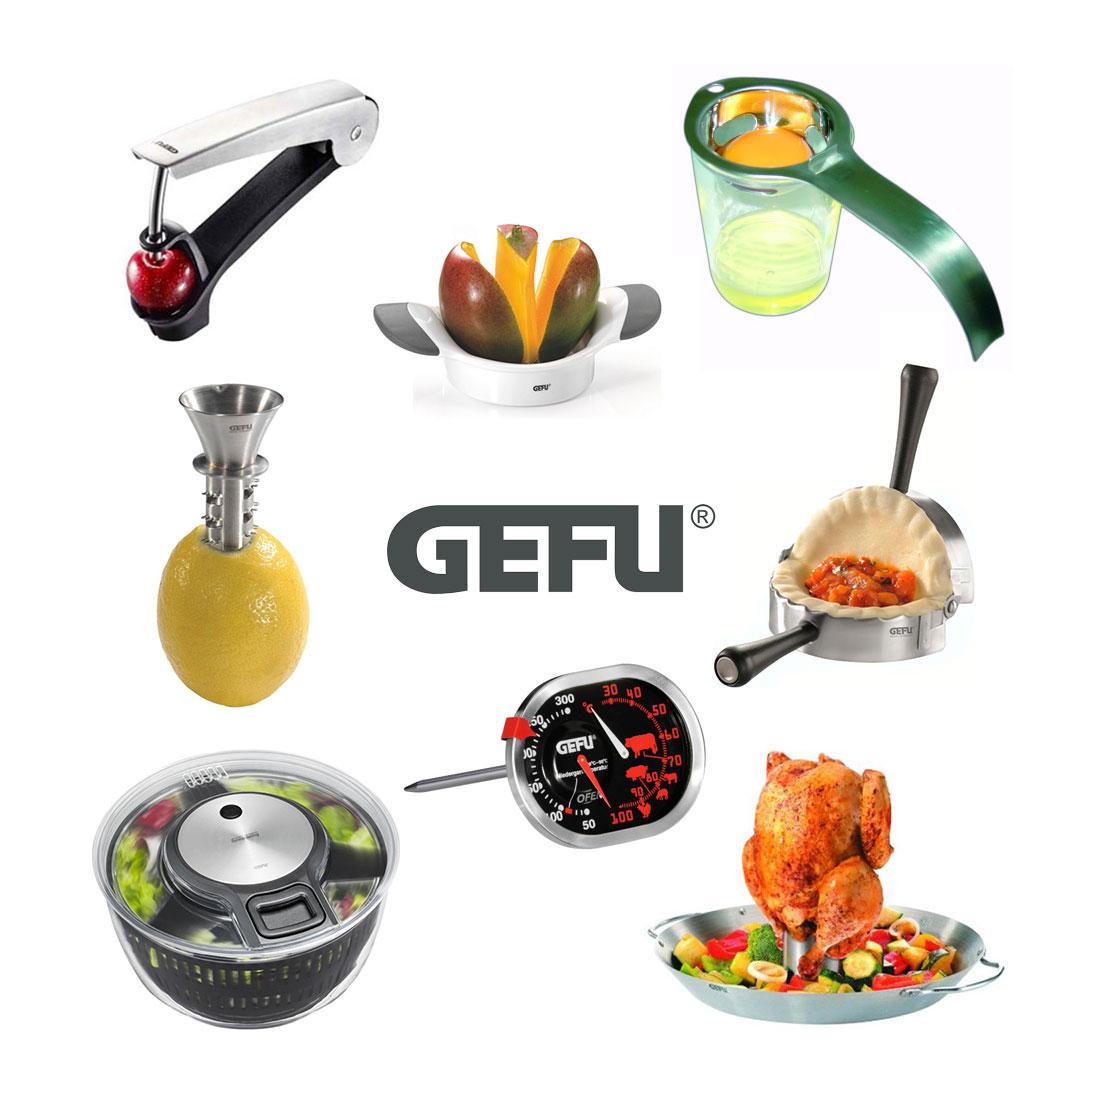 GEFU - Έξυπνες λύσεις στην Κουζίνα